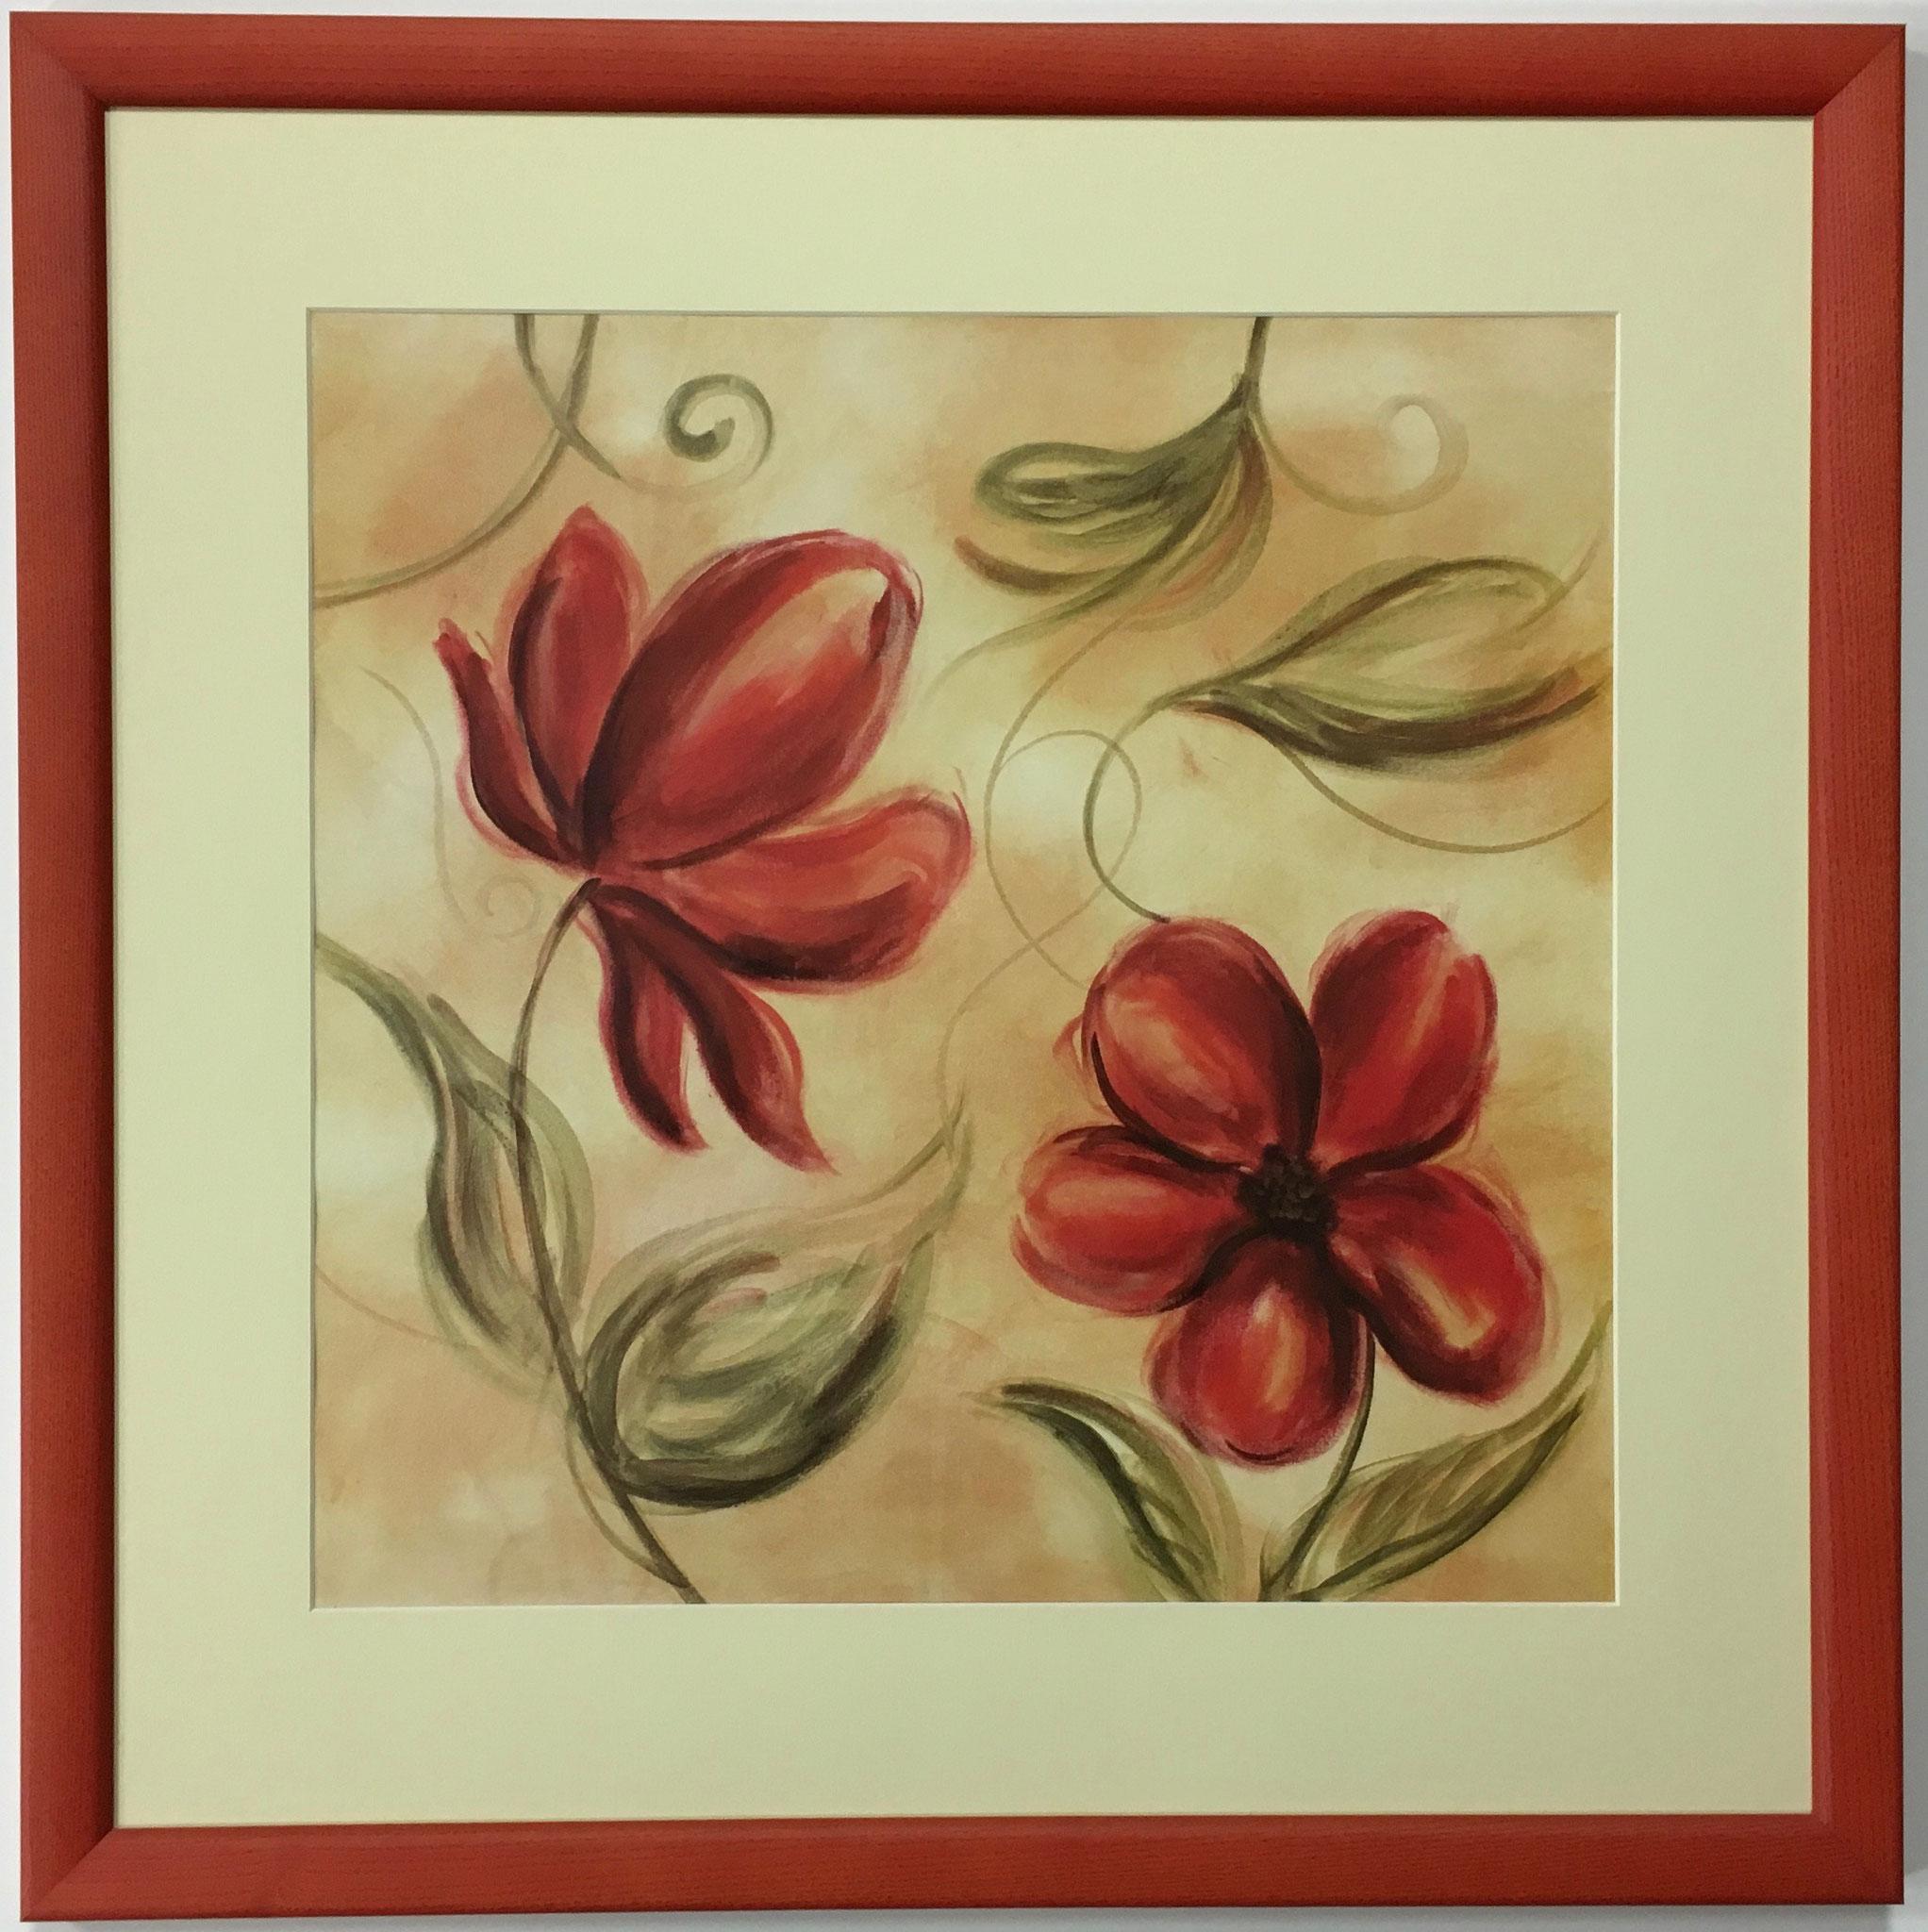 "M. Brey ""Laras Whimsy I"" Kunstdruck mit Passepartout gerahmt Größe/Falzmaß: 60,0 x 60,0cm € 145,-"